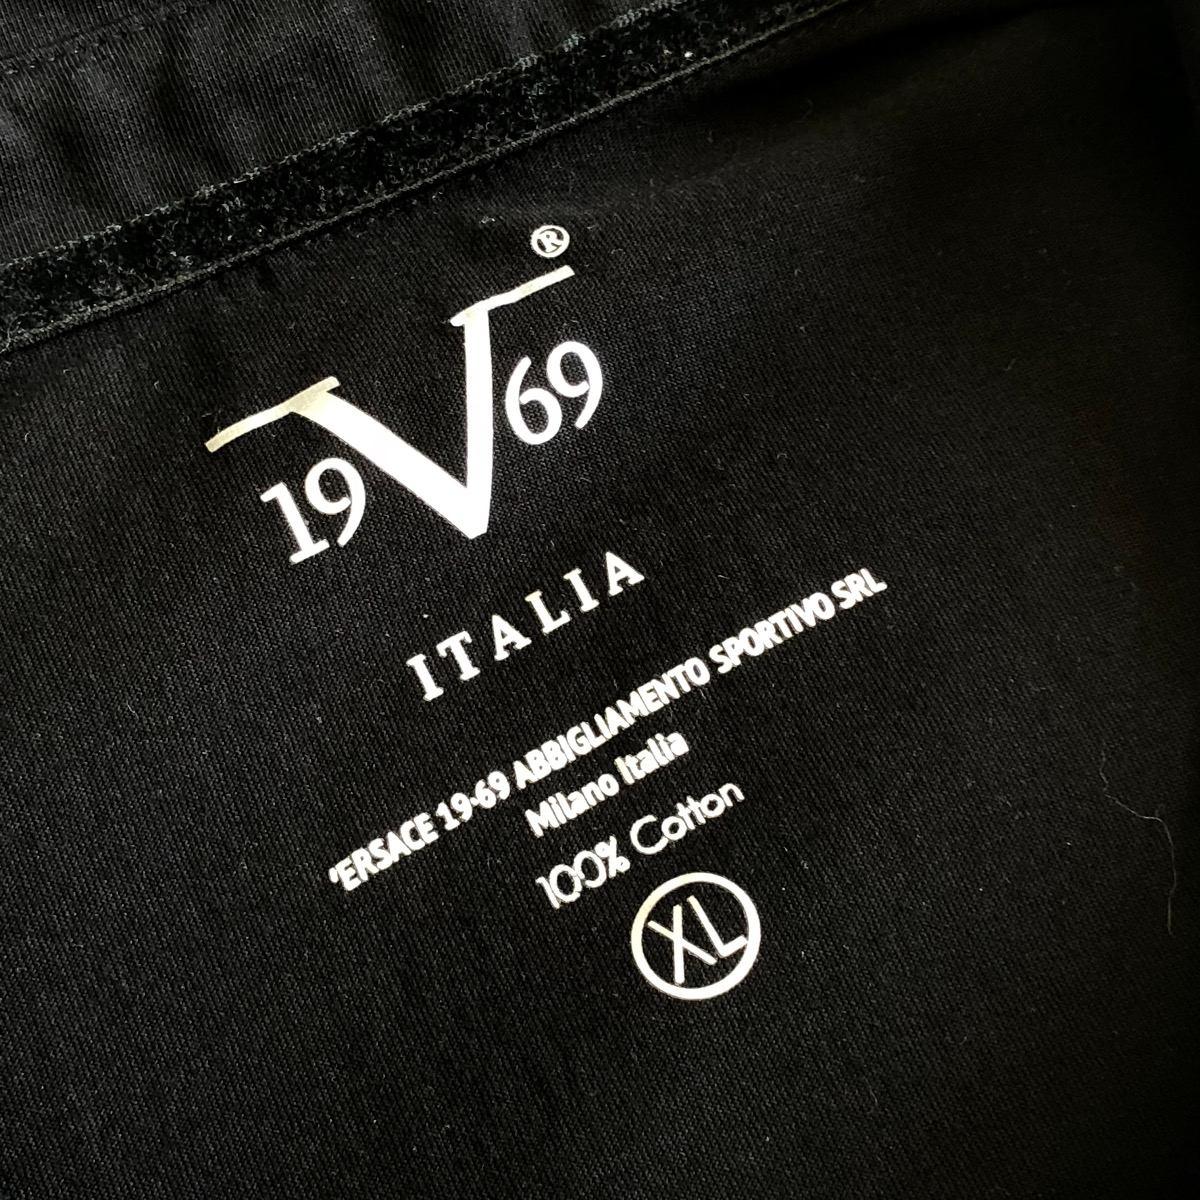 d33f9e4279 camisa polo masculina slim fit versace original italia italy. Carregando  zoom.